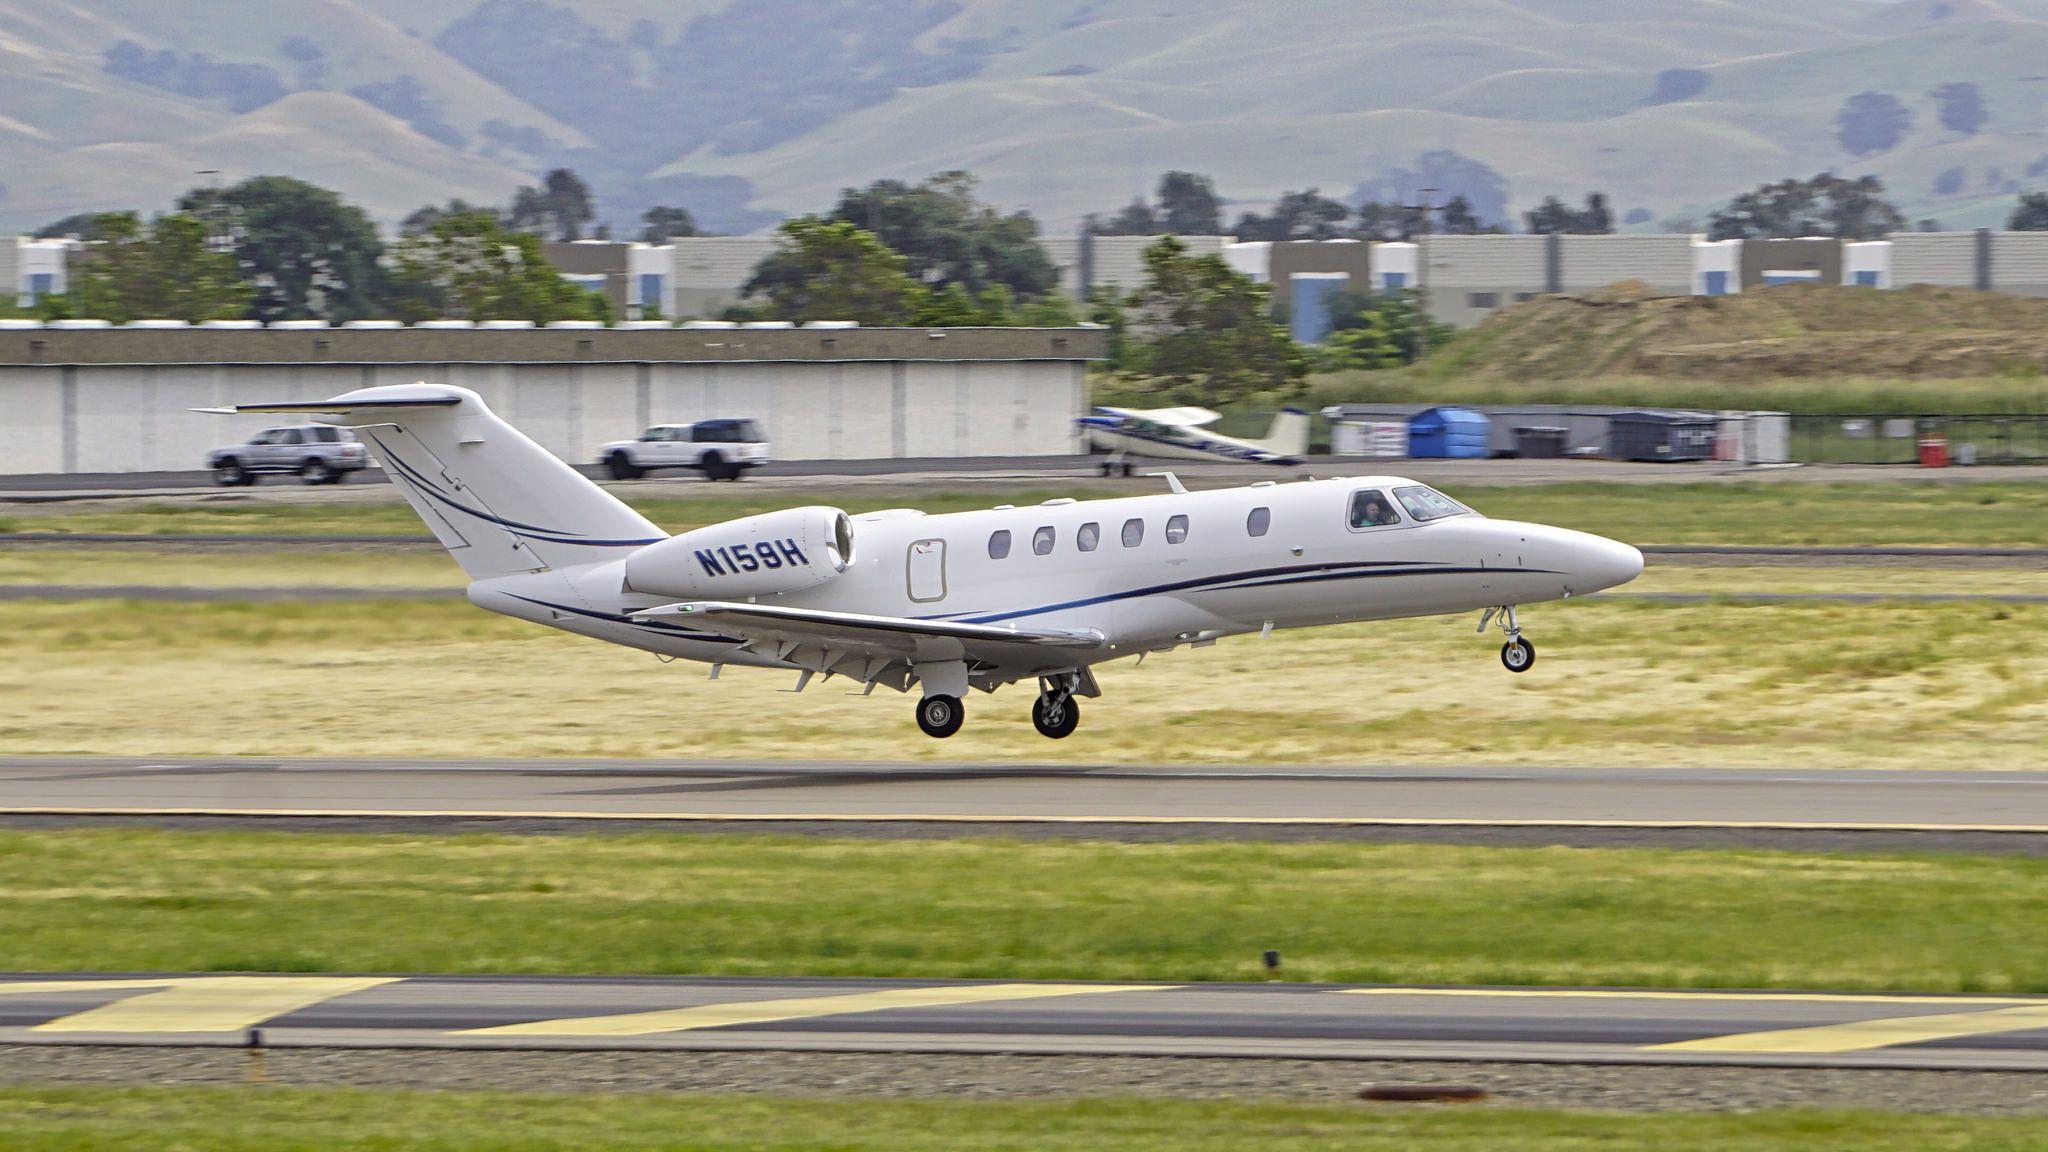 Cessna 525c Citation Cj4 N159h Livermore Airport California